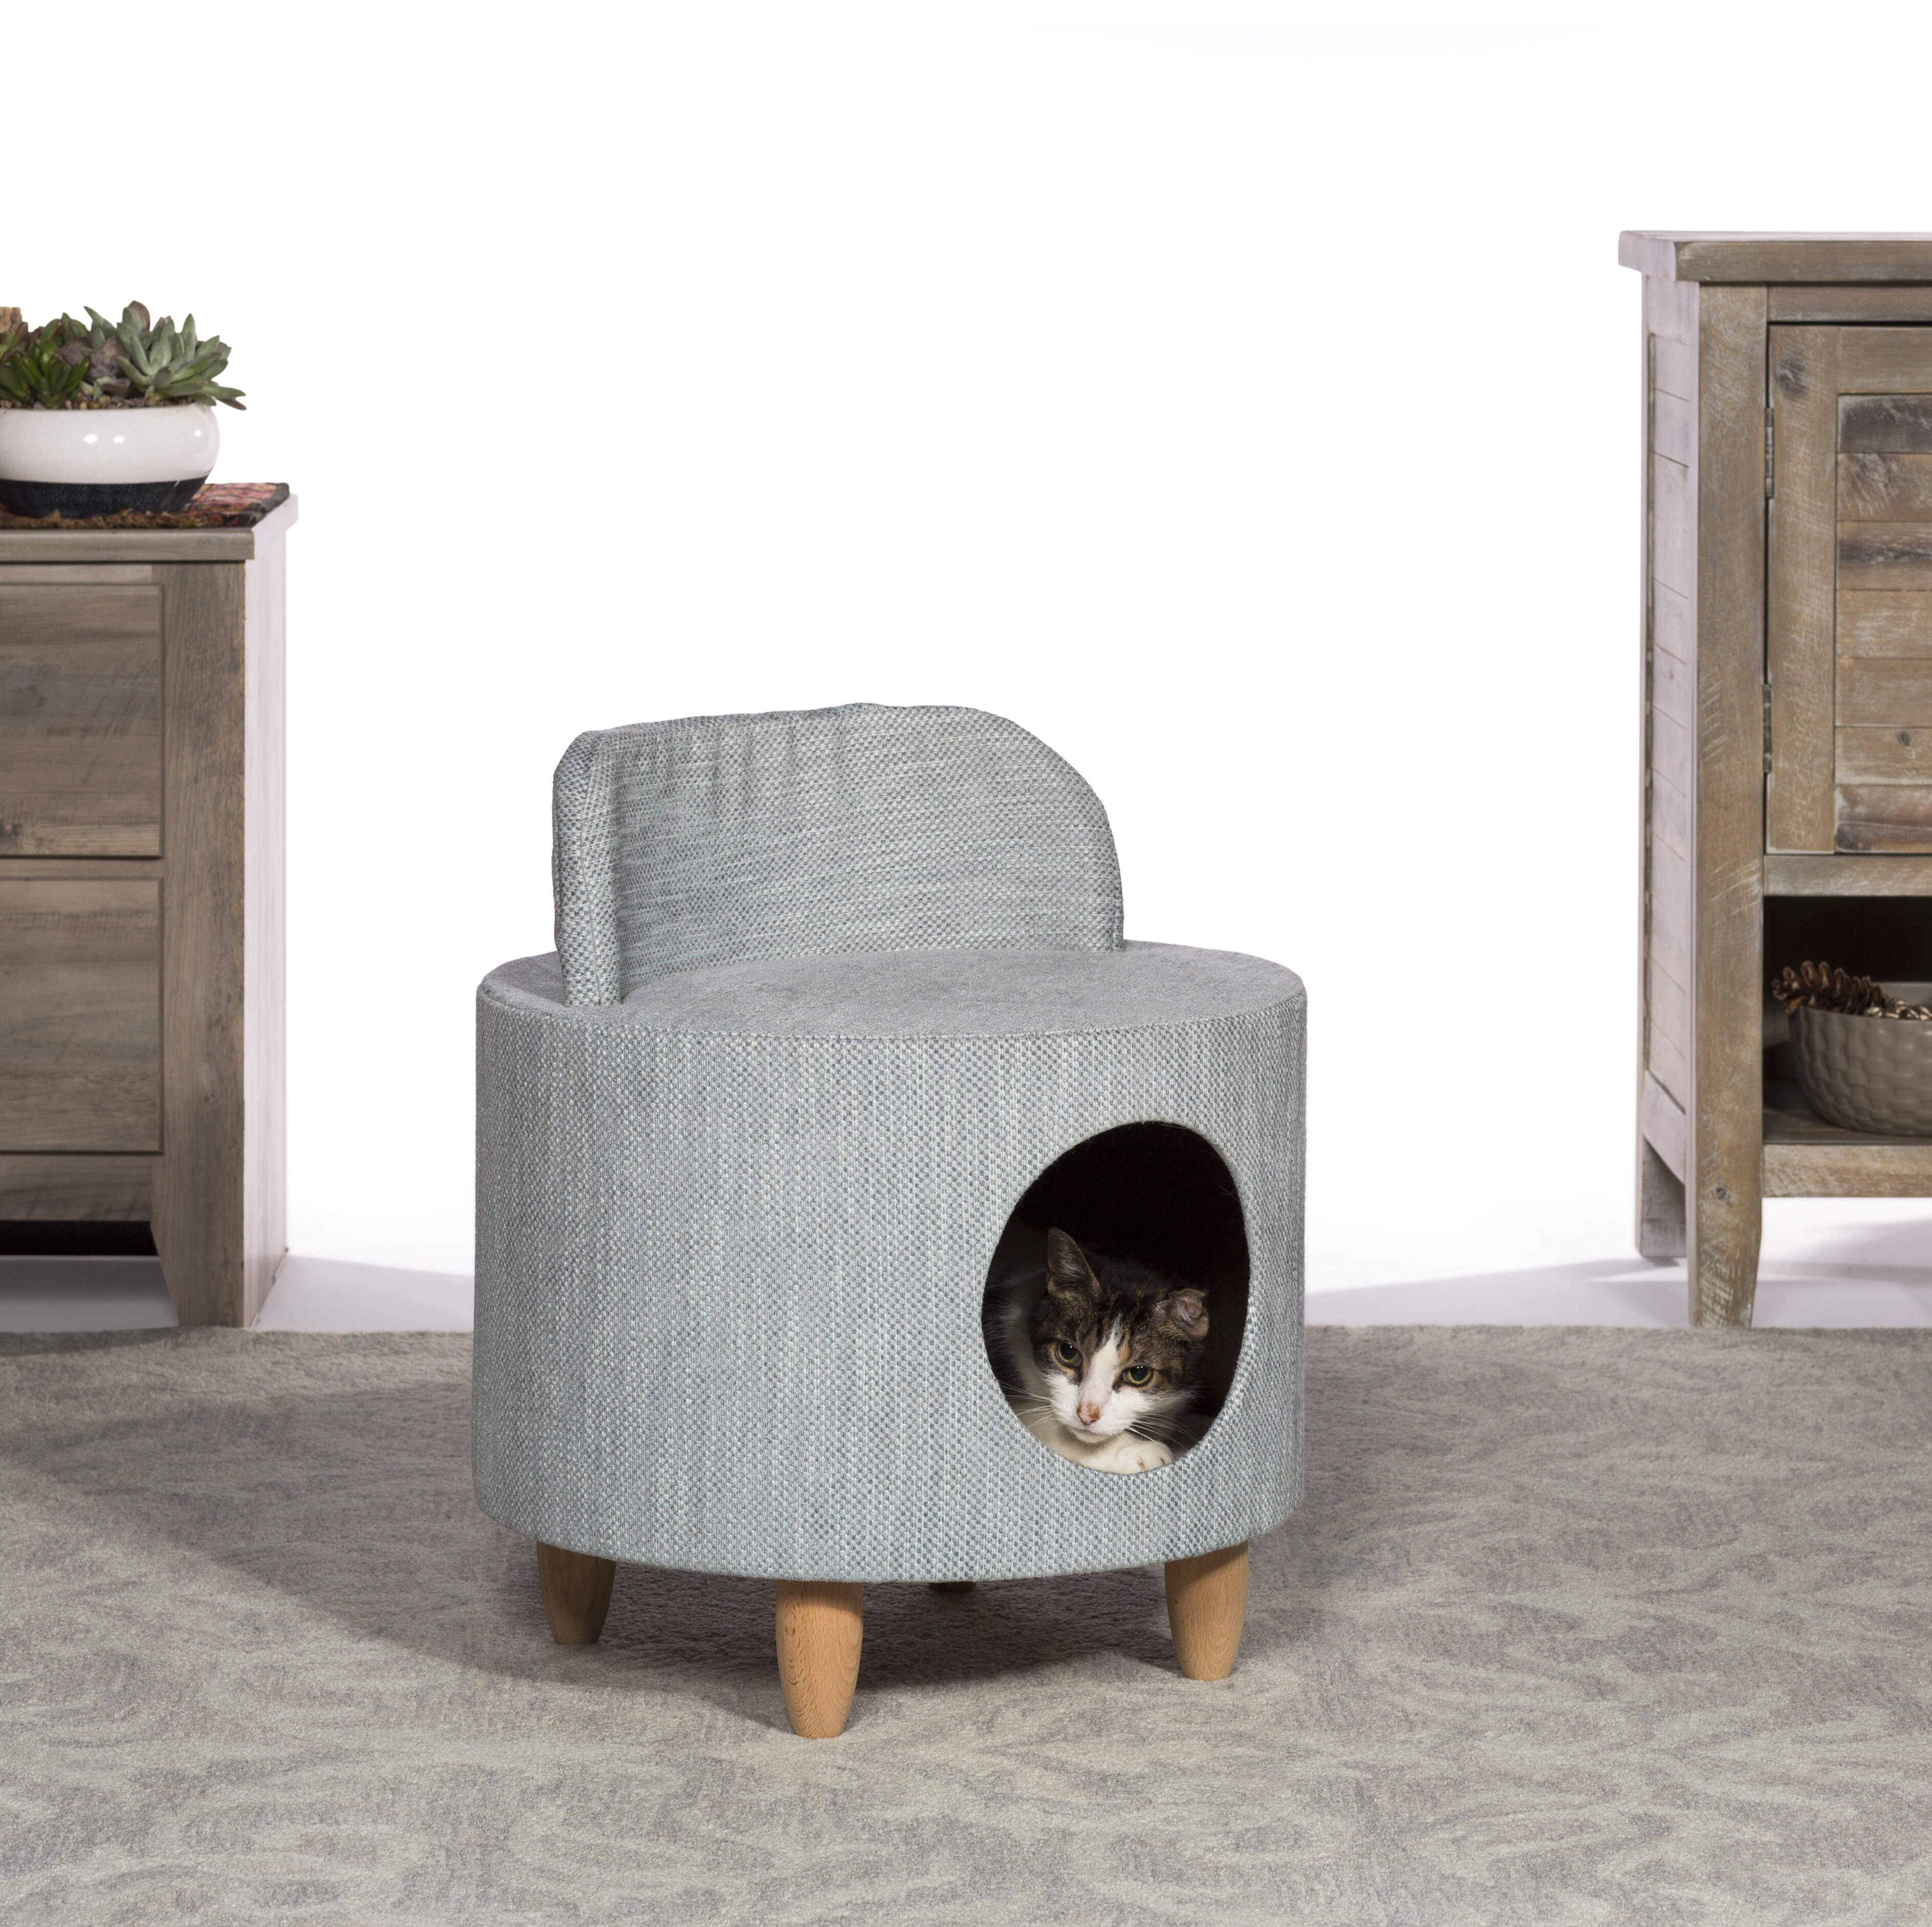 Pleasing 22 Boland Kitty Power Paws Plush Hollywood Chair Cat Condo Customarchery Wood Chair Design Ideas Customarcherynet